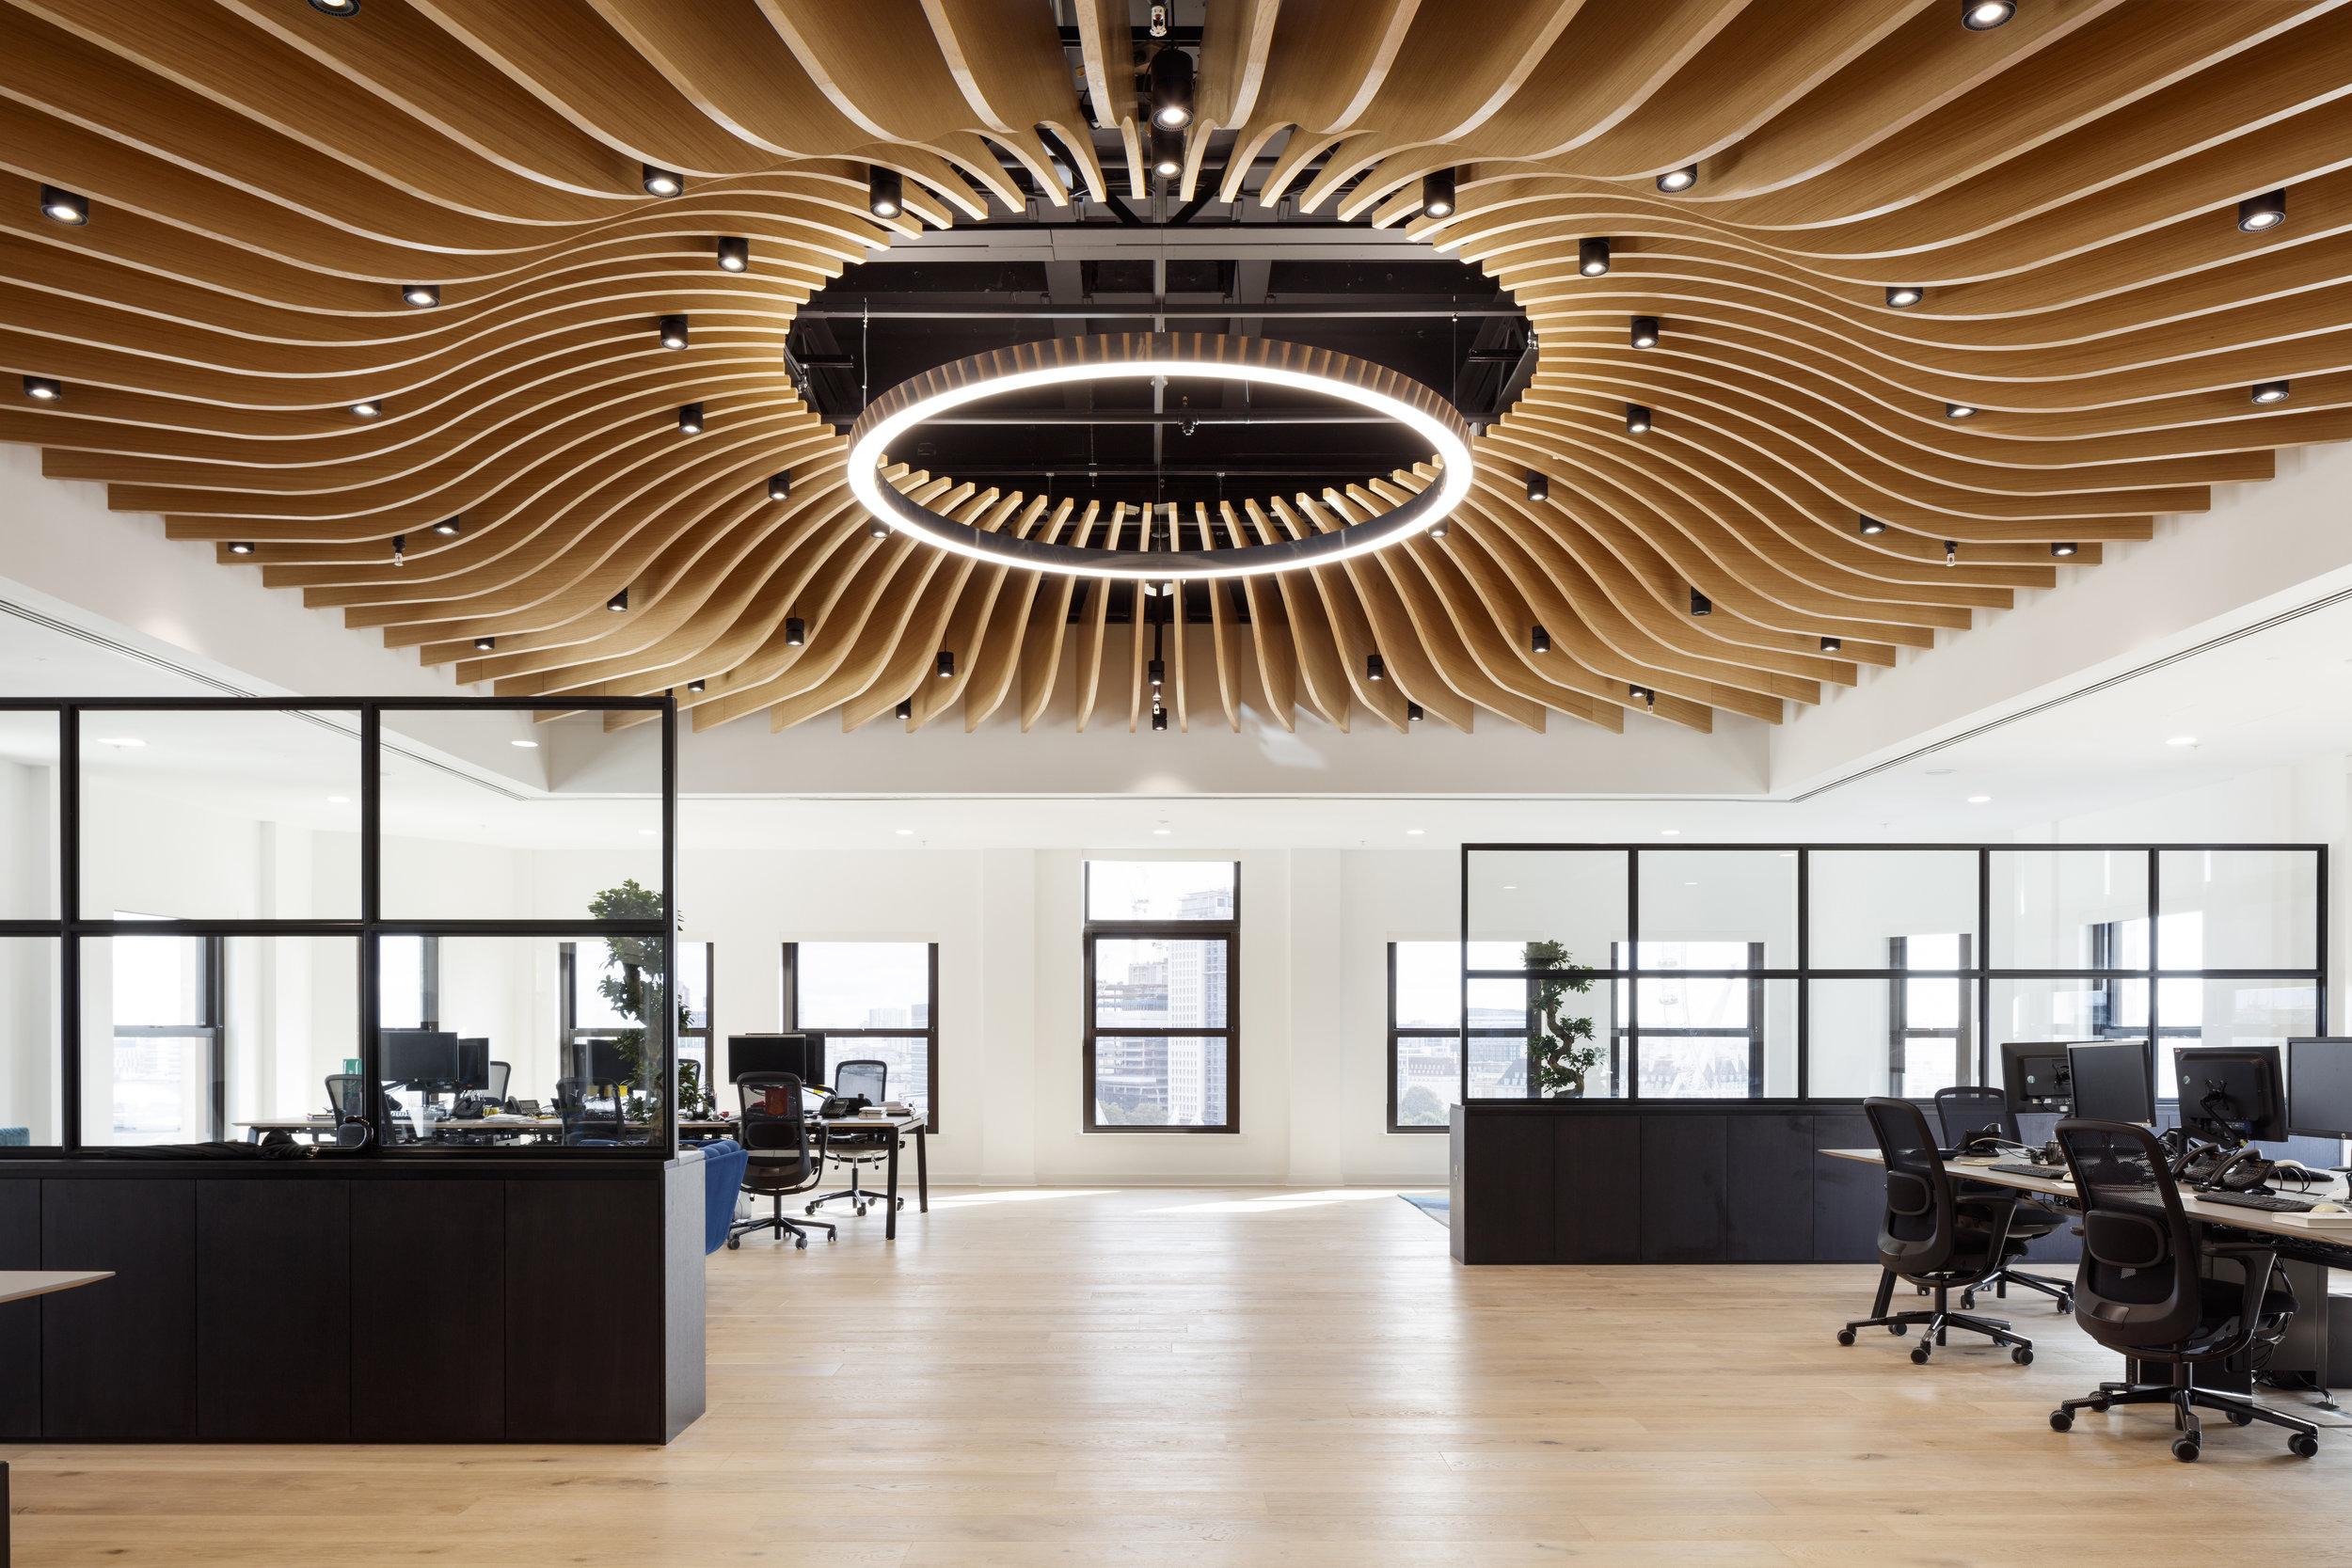 BDG architecture + design